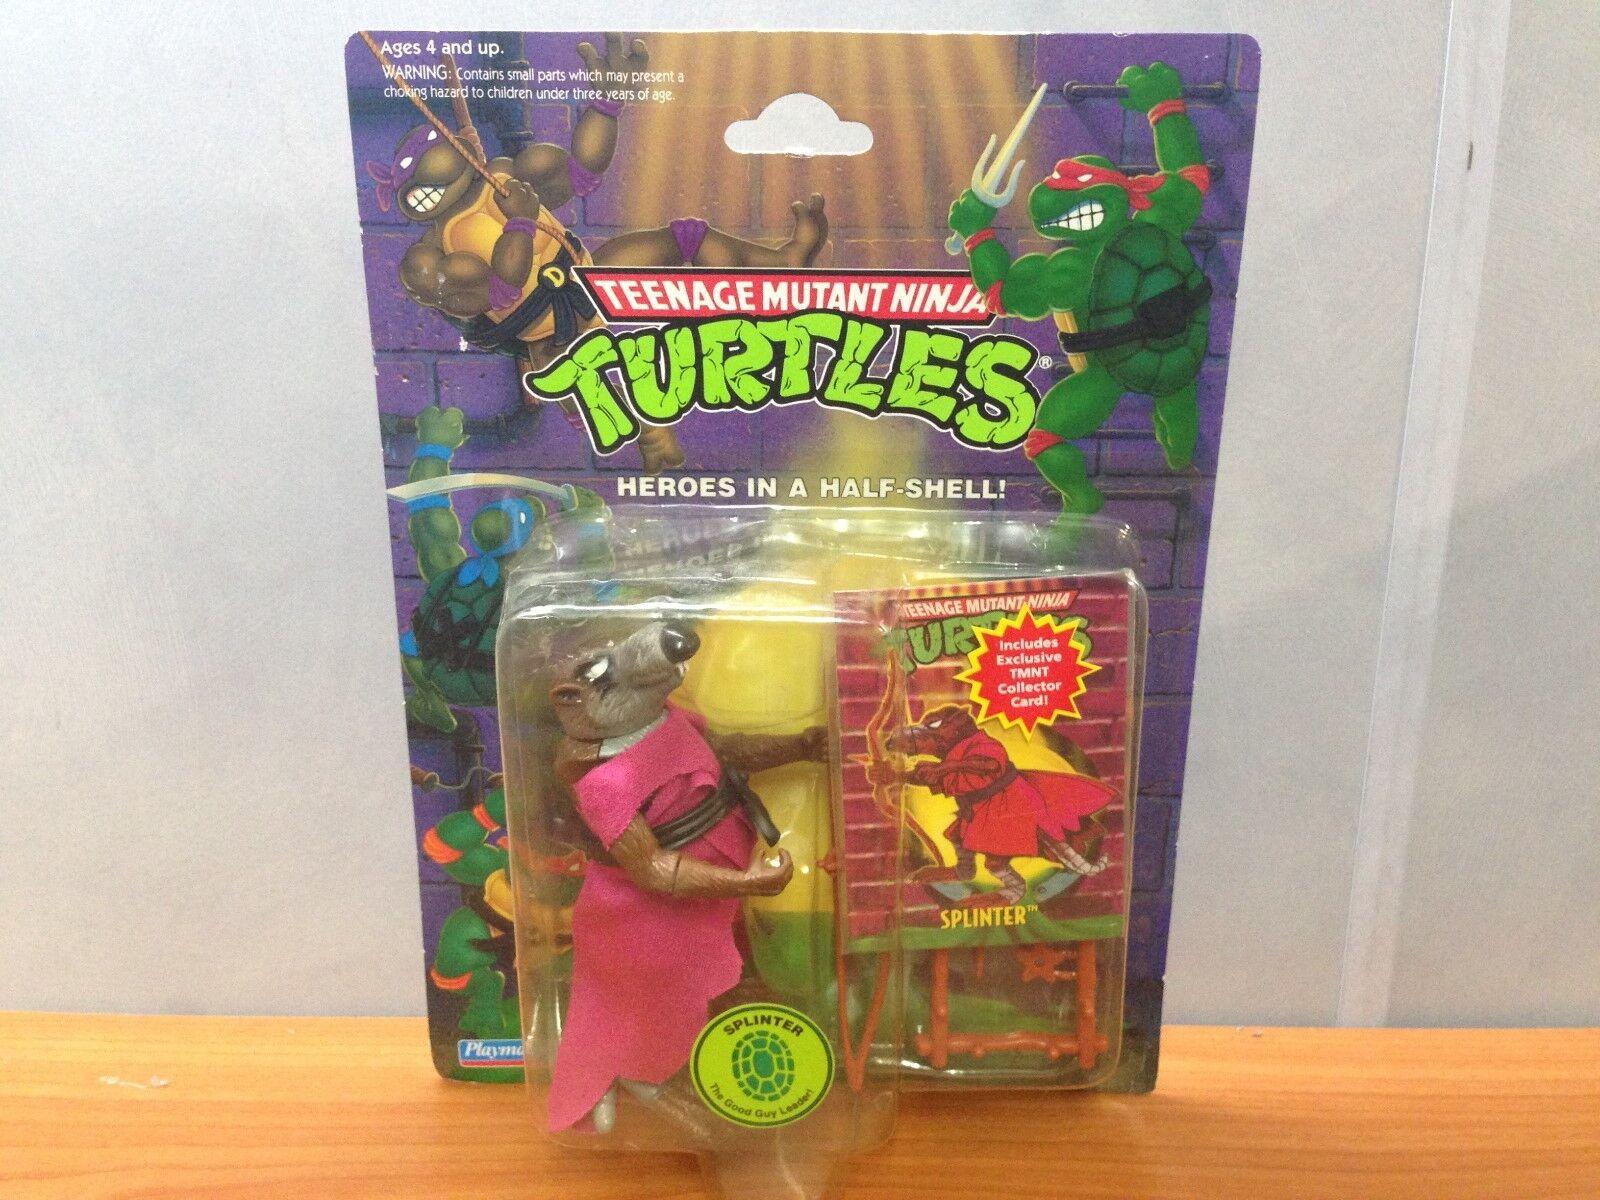 Original Vintage 1989 TMNT Action Figure - Splinter - MOSC